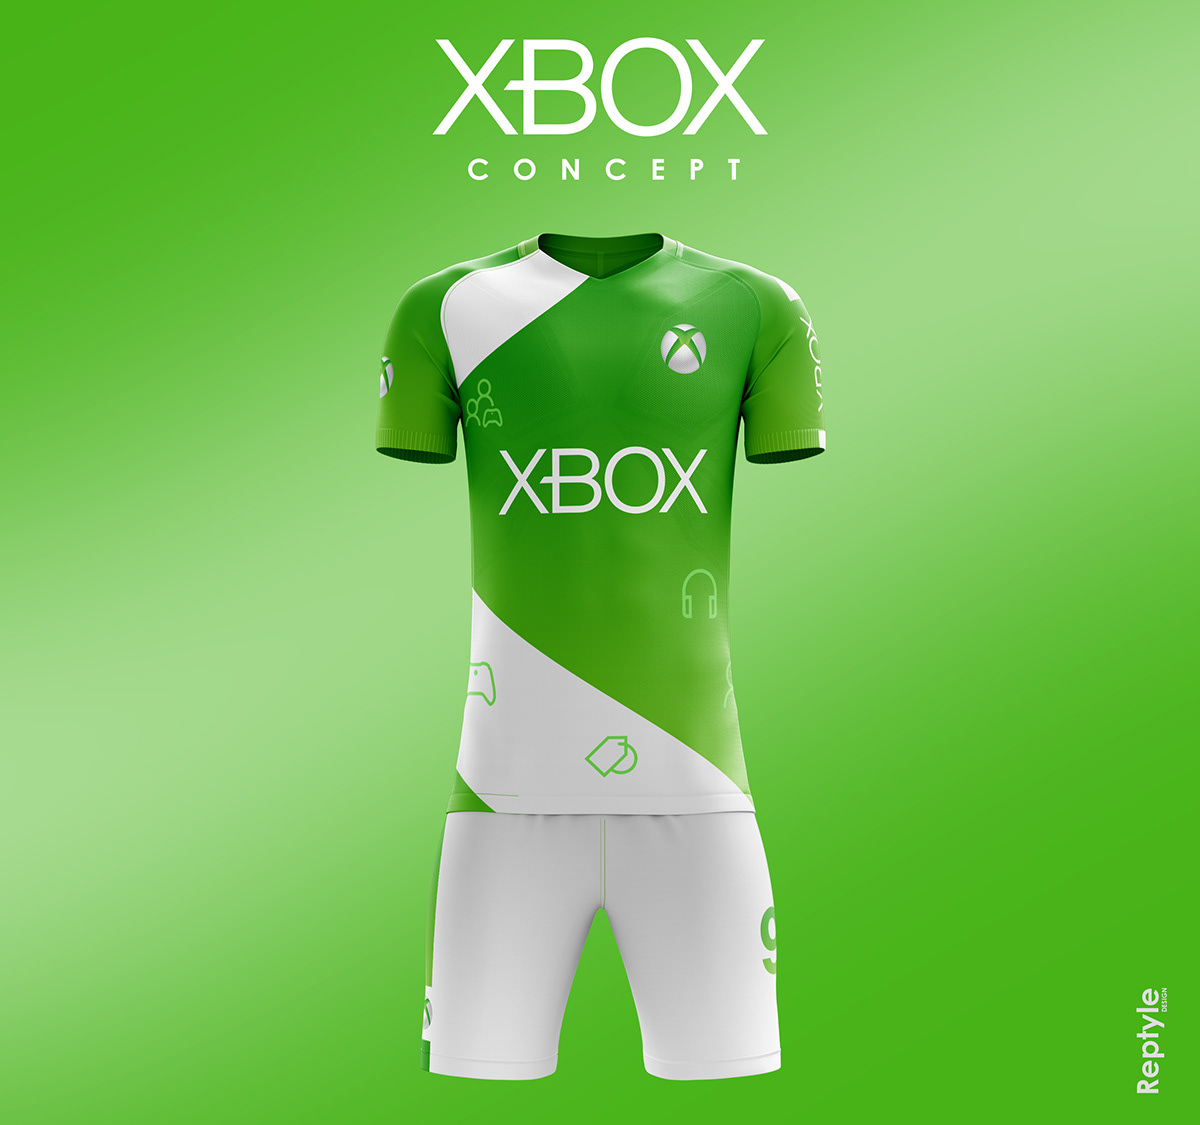 Xbox soccer kit concept. Maurizio Moretti •. Follow Following Unfollow. Save  to Collection 8e2480877